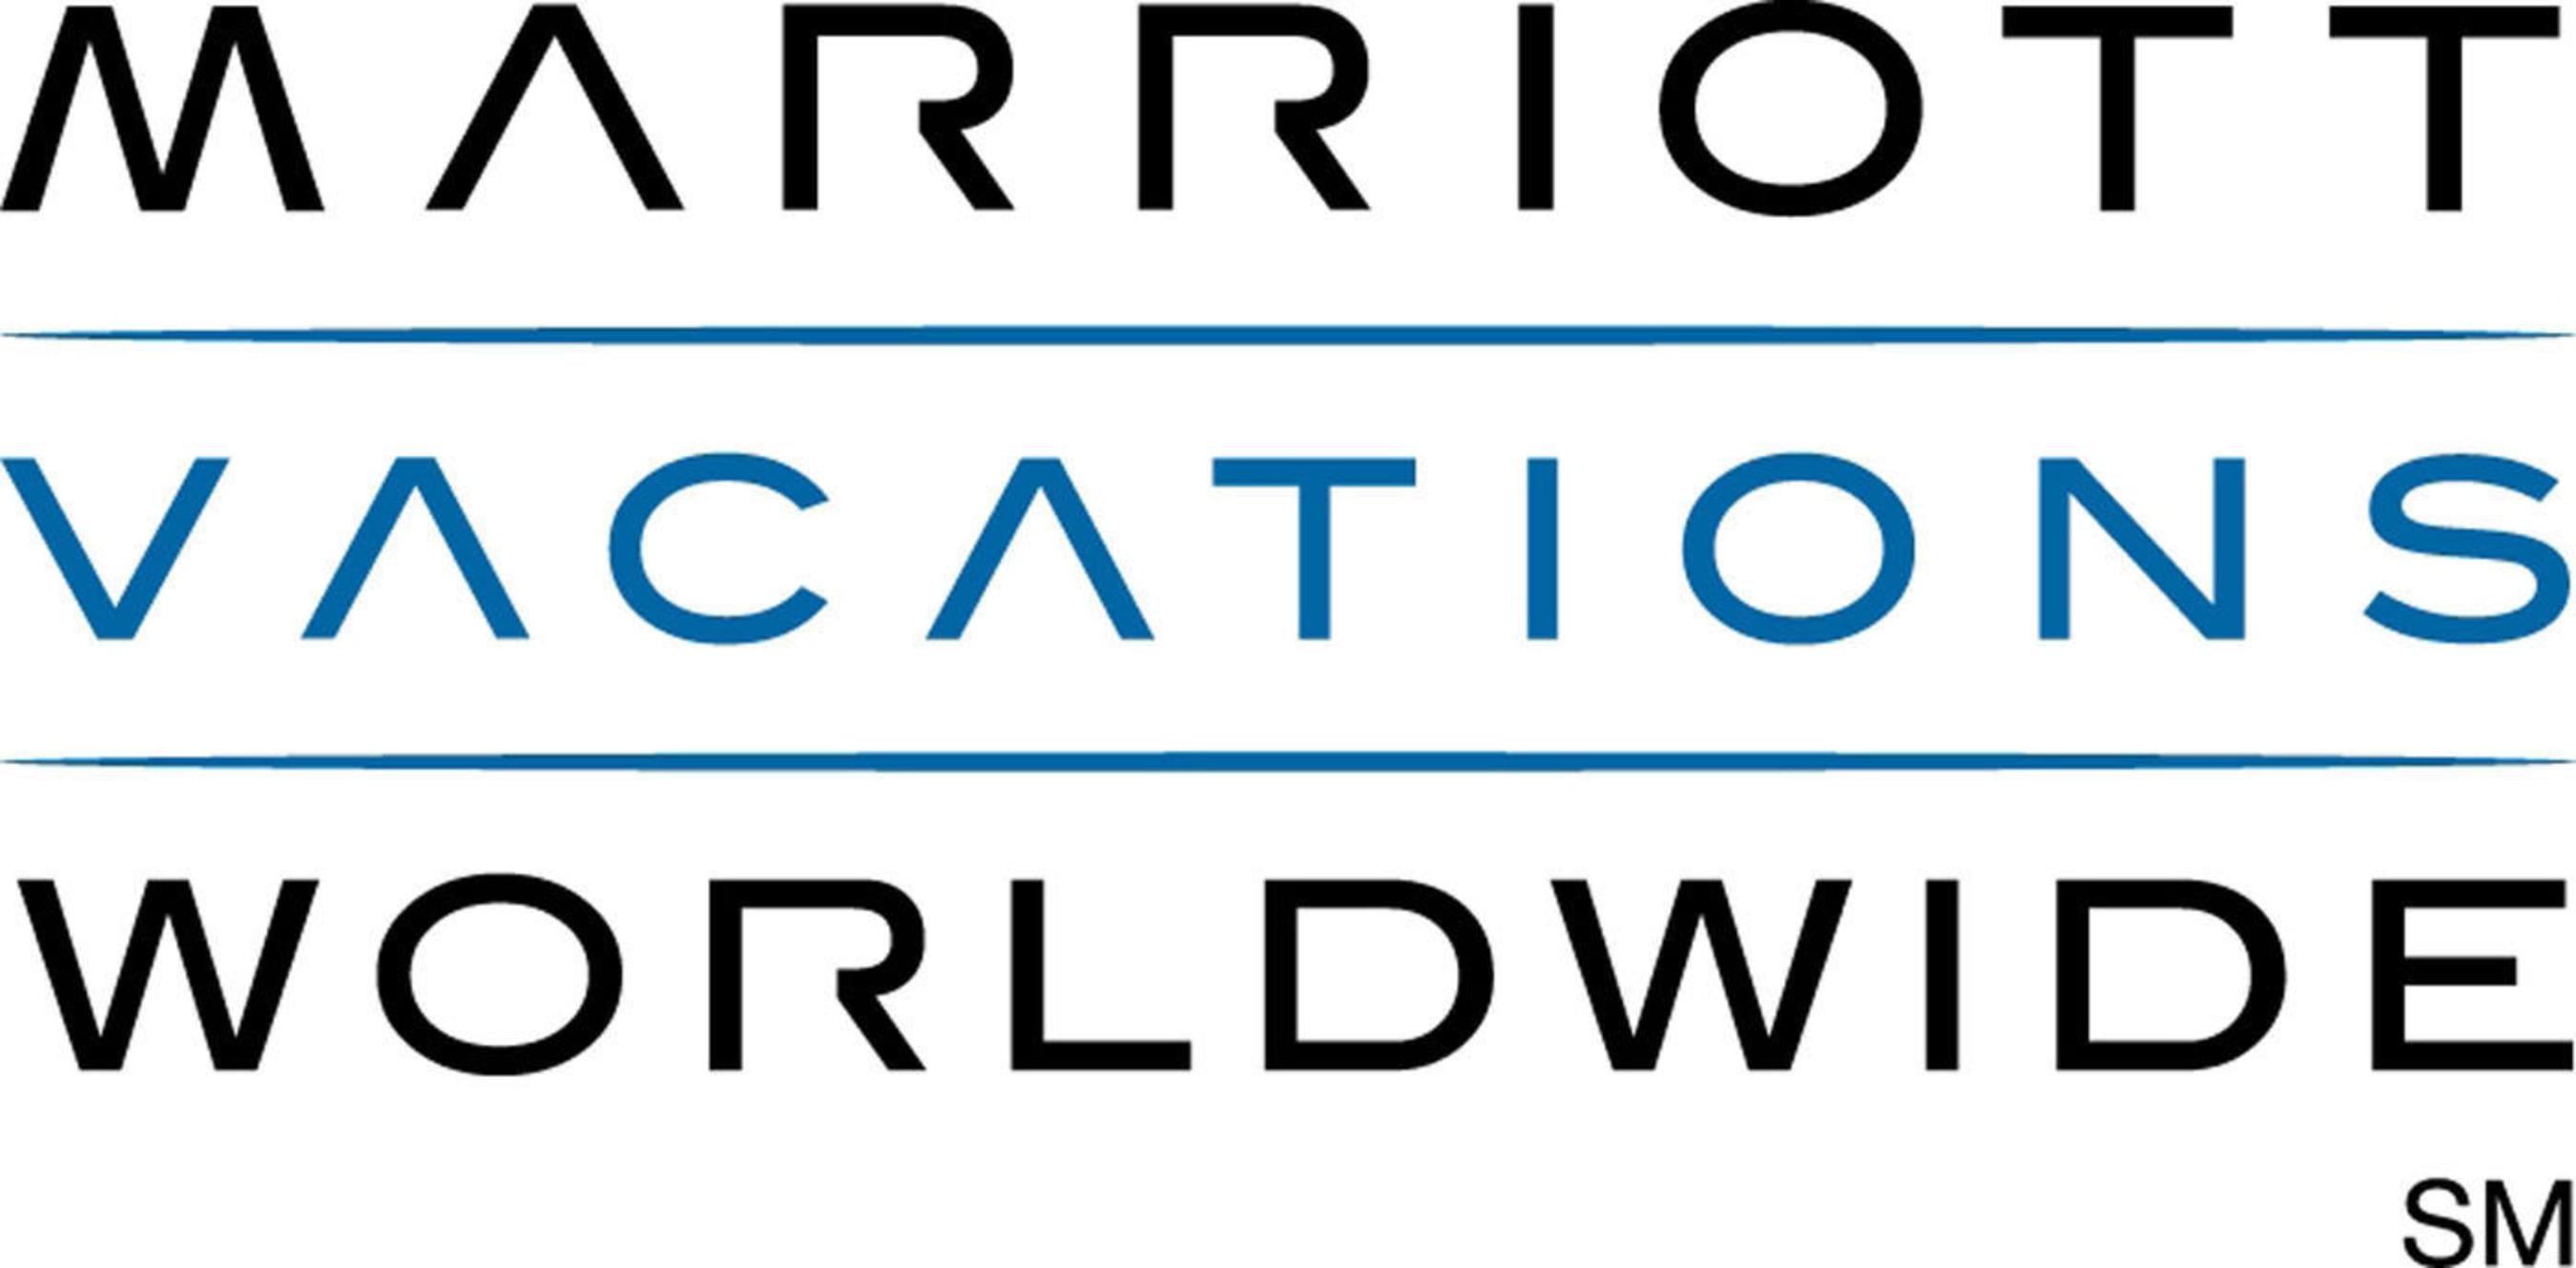 Marriott Vacations Worldwide Corporation.